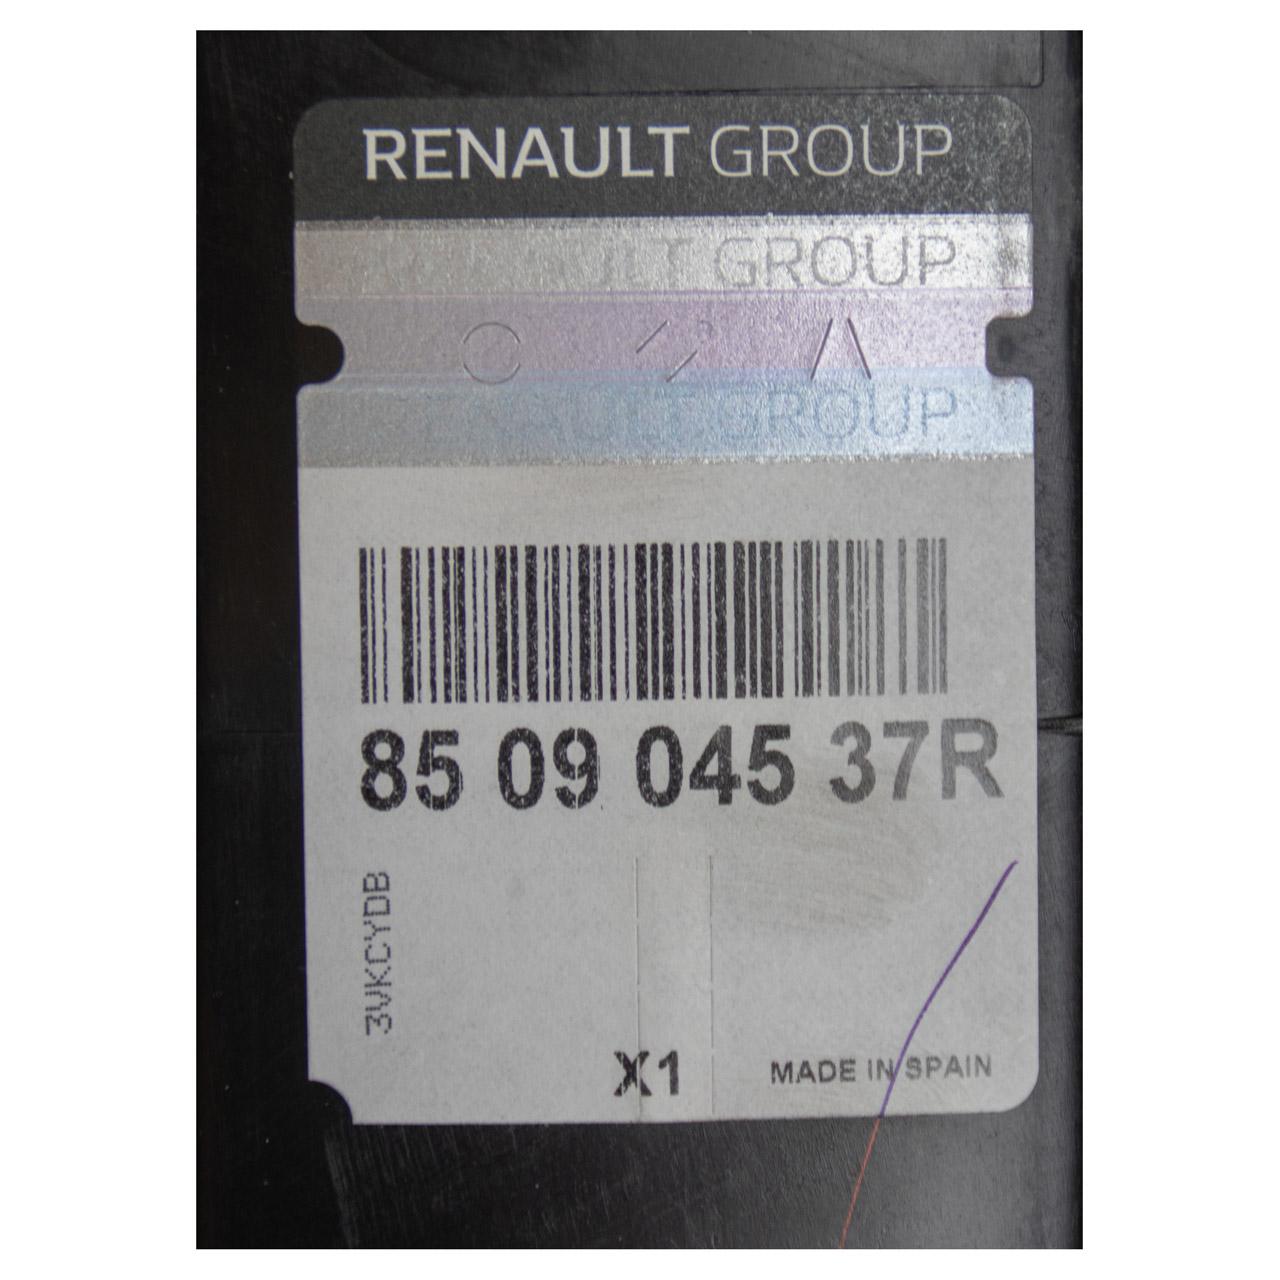 ORIGINAL Renault Aufprallschutz Stoßstangenträger CAPTUR hinten oben 850904537R